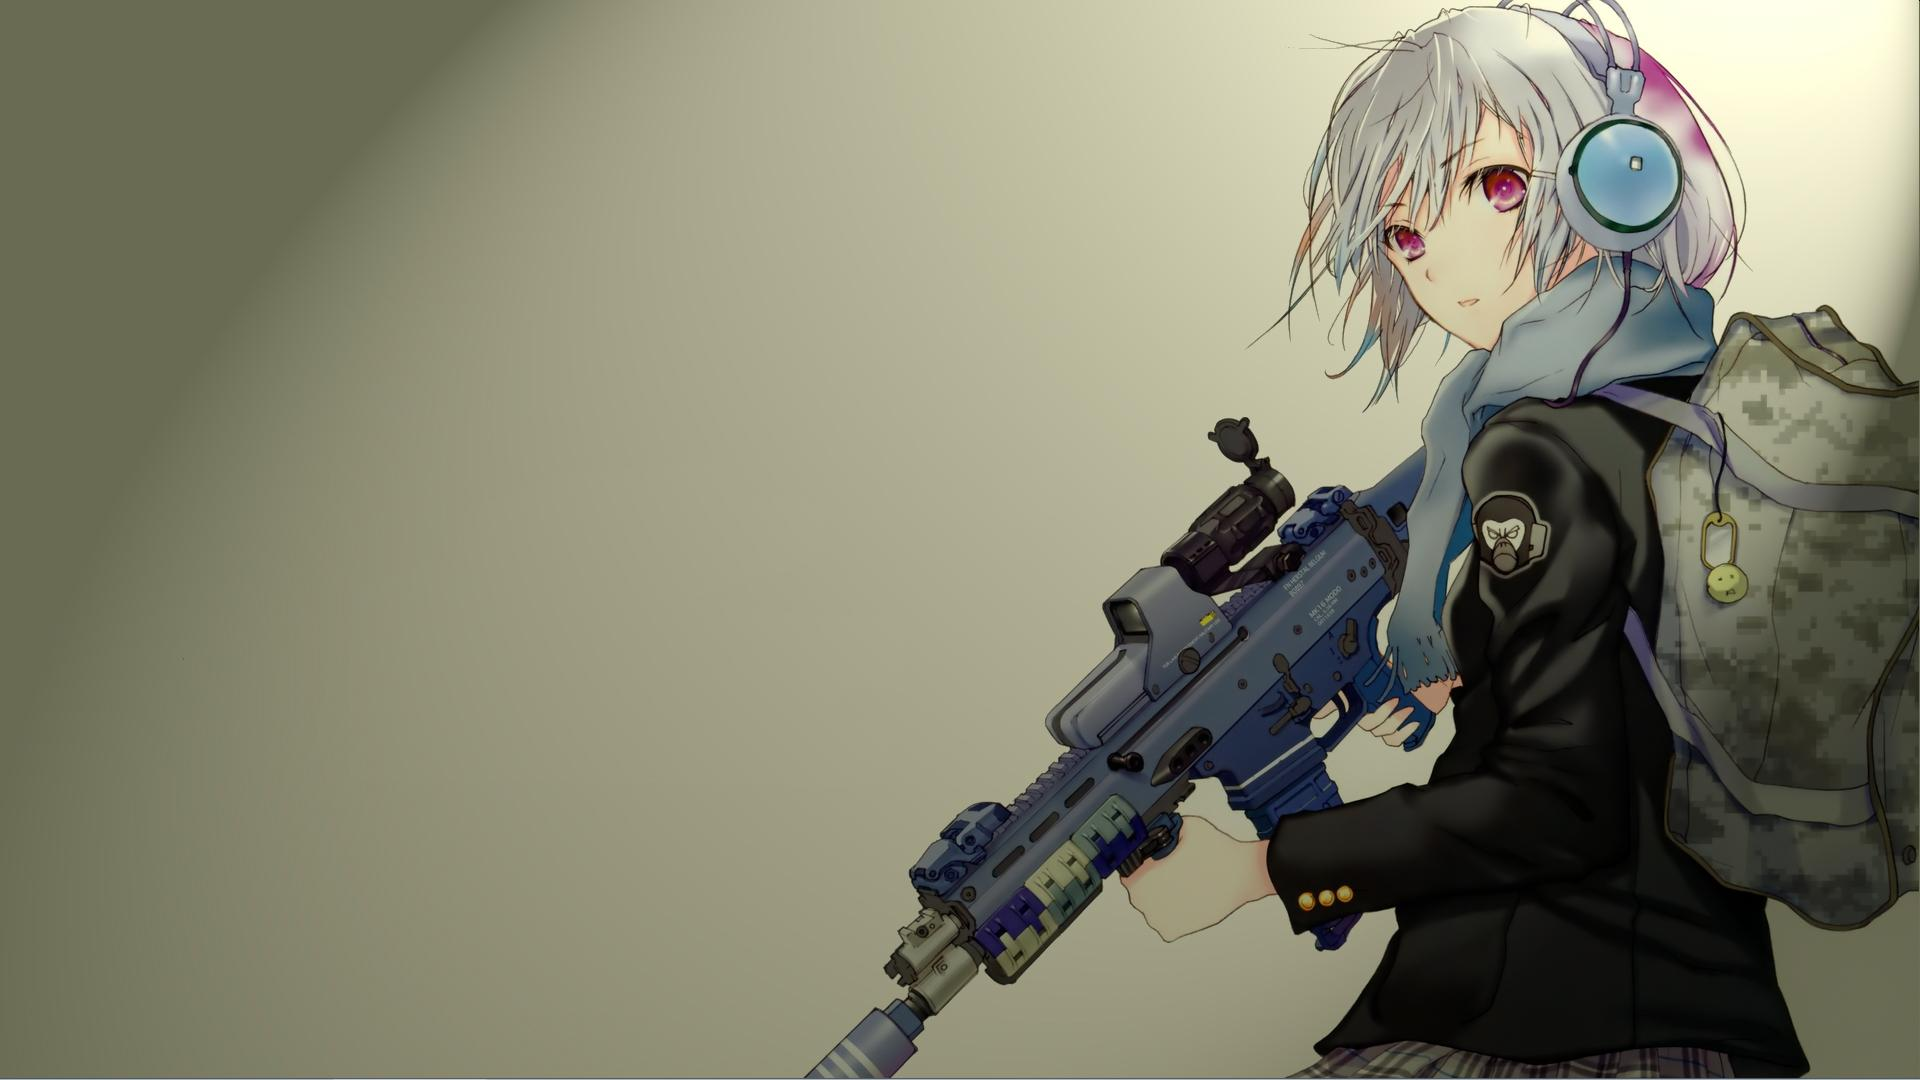 Anime - Unknown  Girl Rifle Short Hair Gun Headphones White Hair Anime Artistic Wallpaper